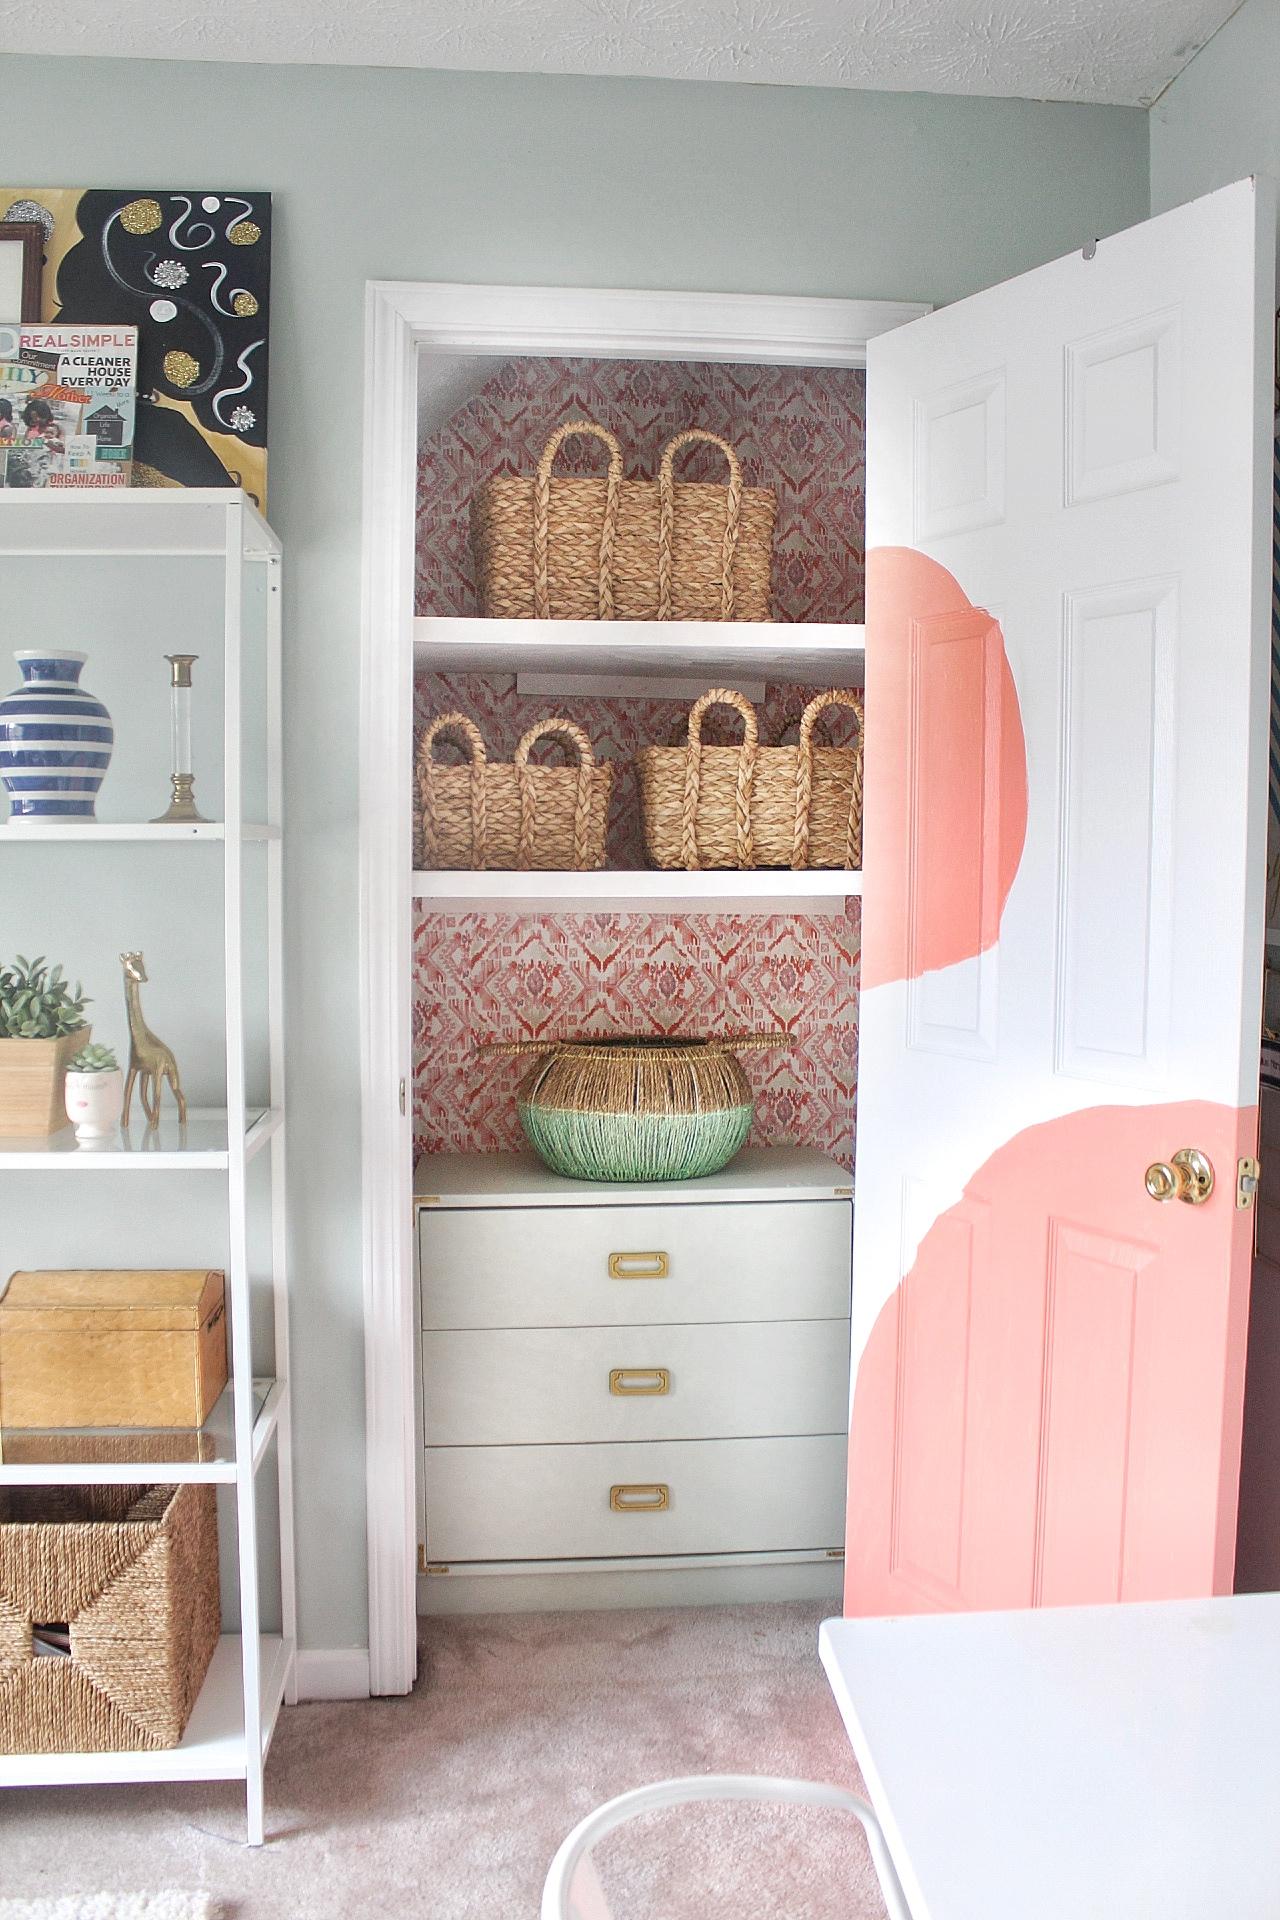 wallpaper in closet-budget closet makeover